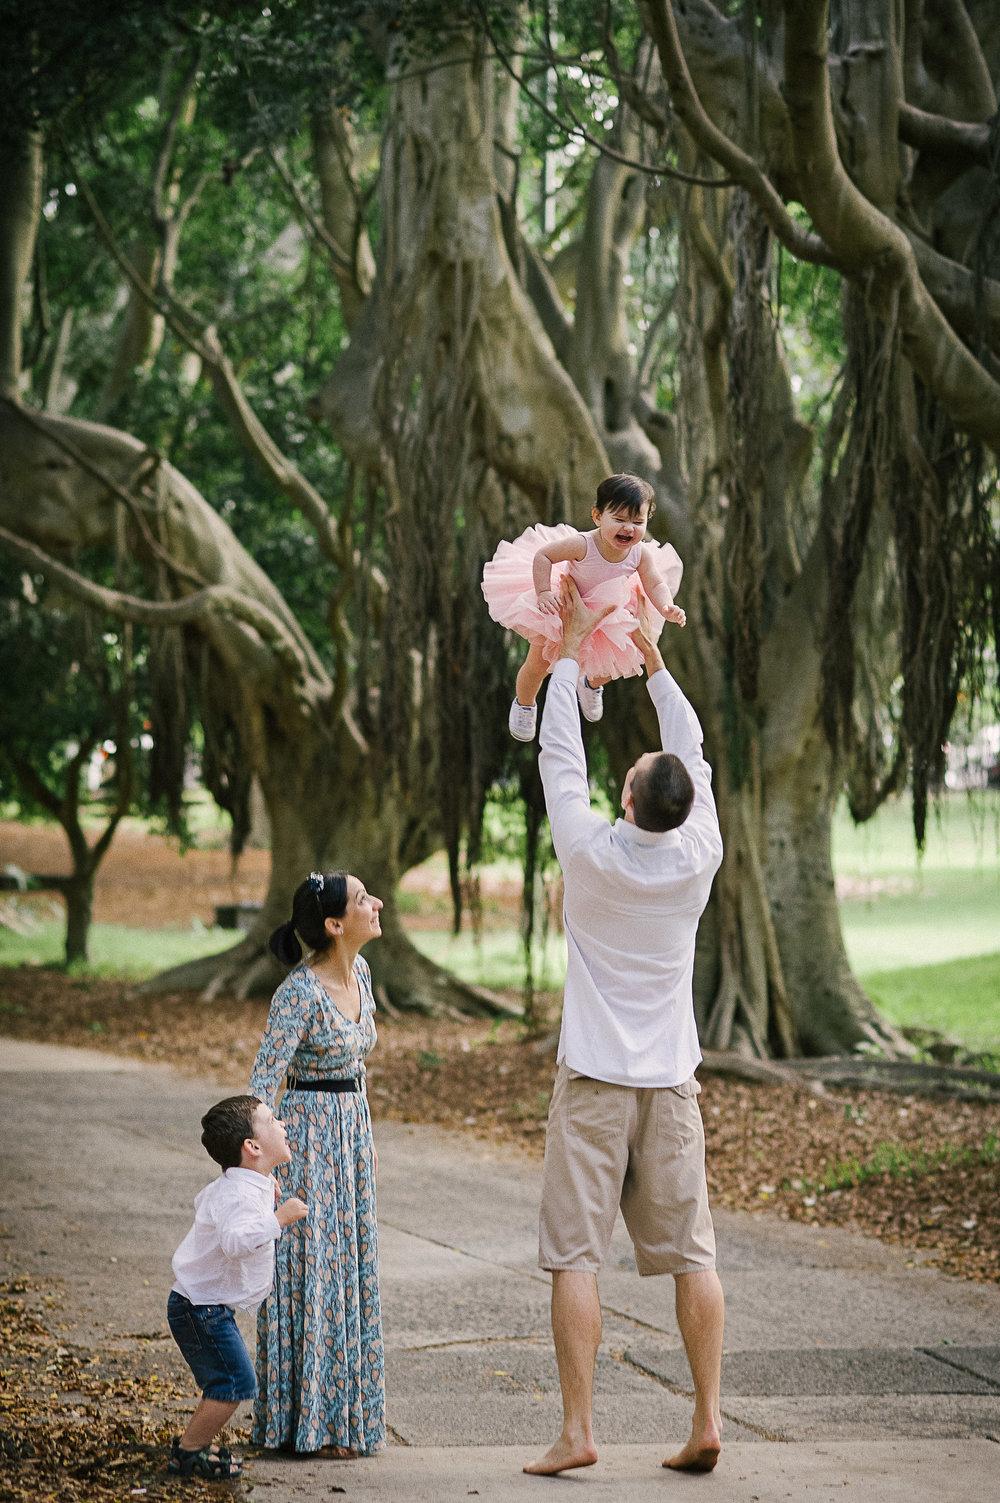 family_photographer_sydney_cronulla_sutherland_shire.jpg